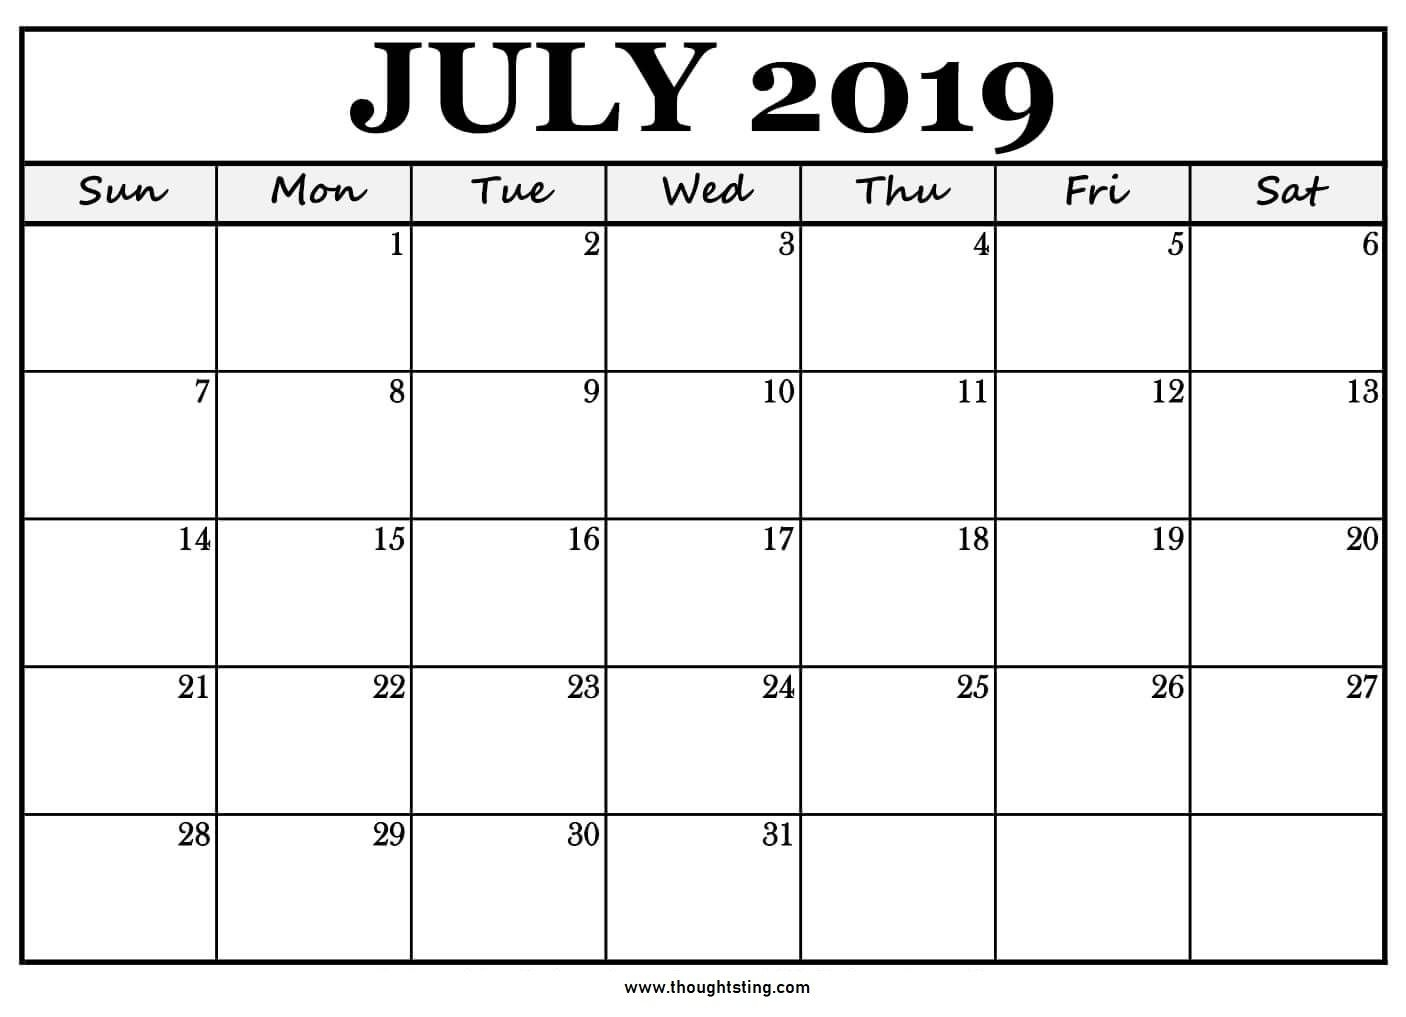 Printable July 2019 Calendar Large Boxes | July Calendar